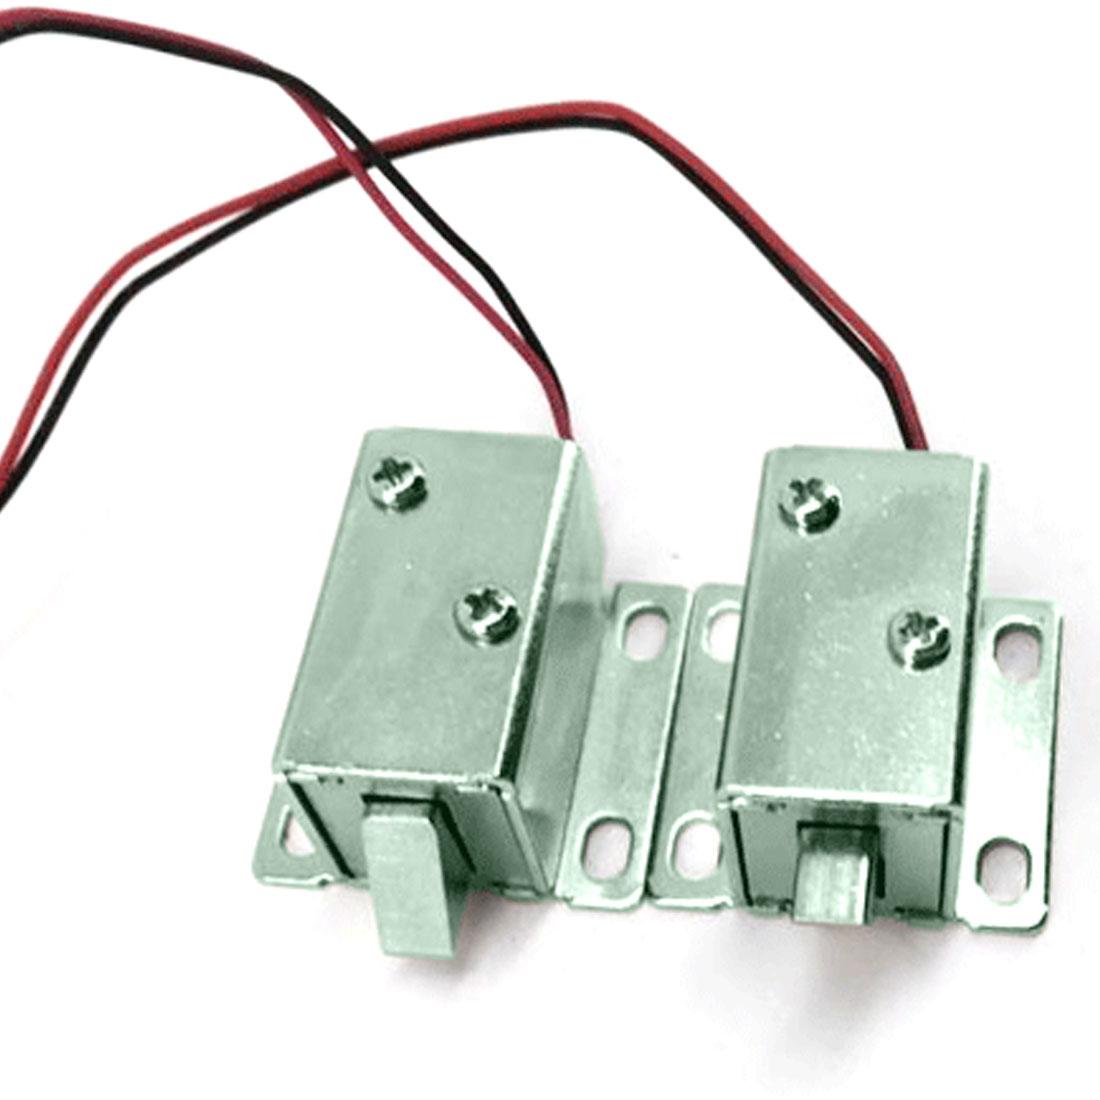 0627-28-12v Dc 12v Electronic Door Lock Electromagnetic Lock For Cabinet Locks/solenoid Locks/drawer Low Price Hardware Home Improvement